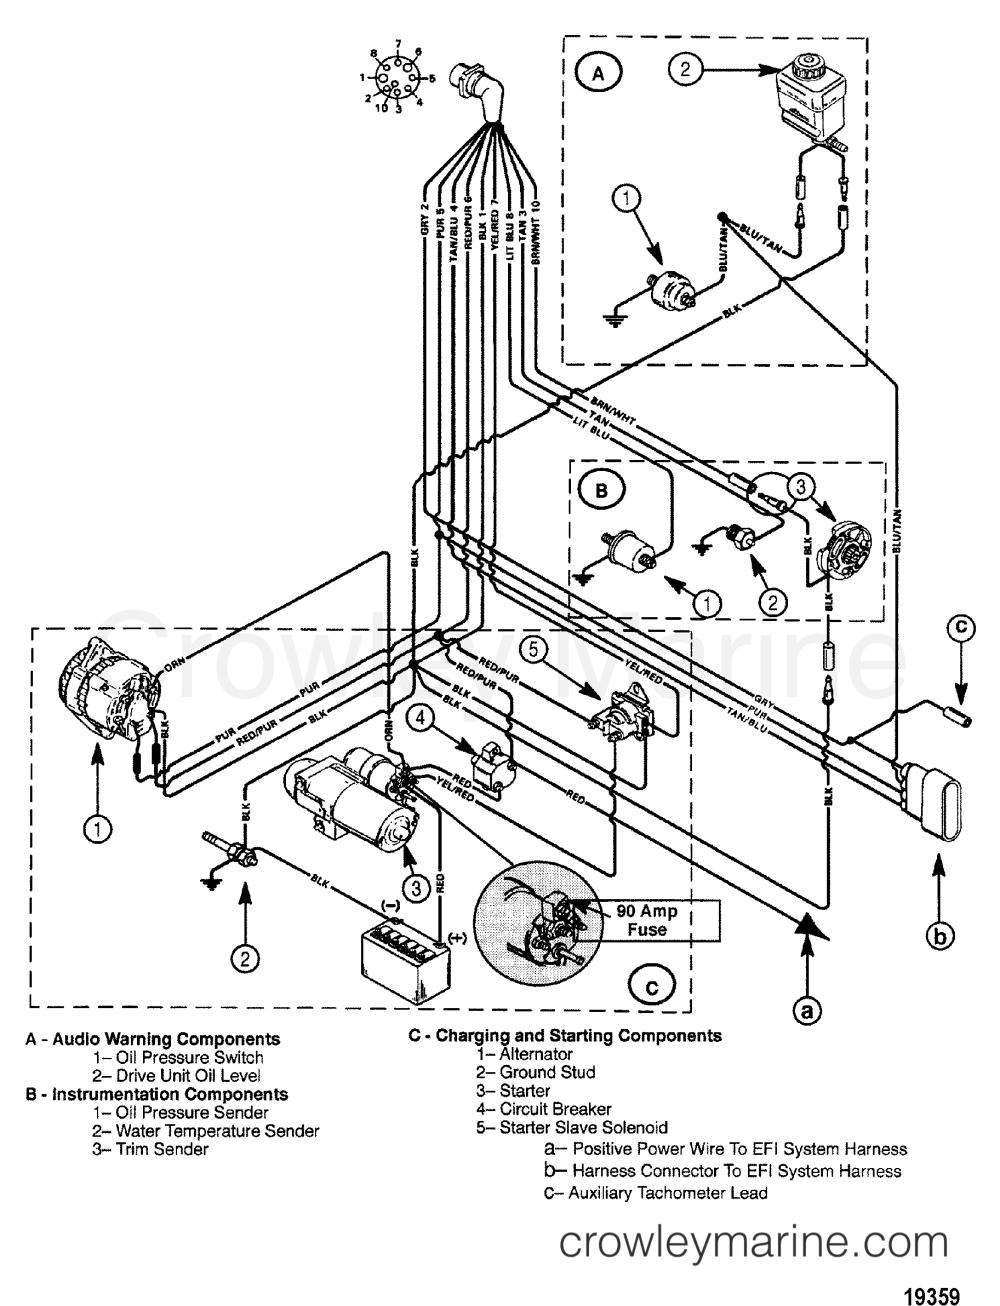 medium resolution of 1998 mercury inboard engine 350 mag mpi horiz 3f4107jm1 wiring harness